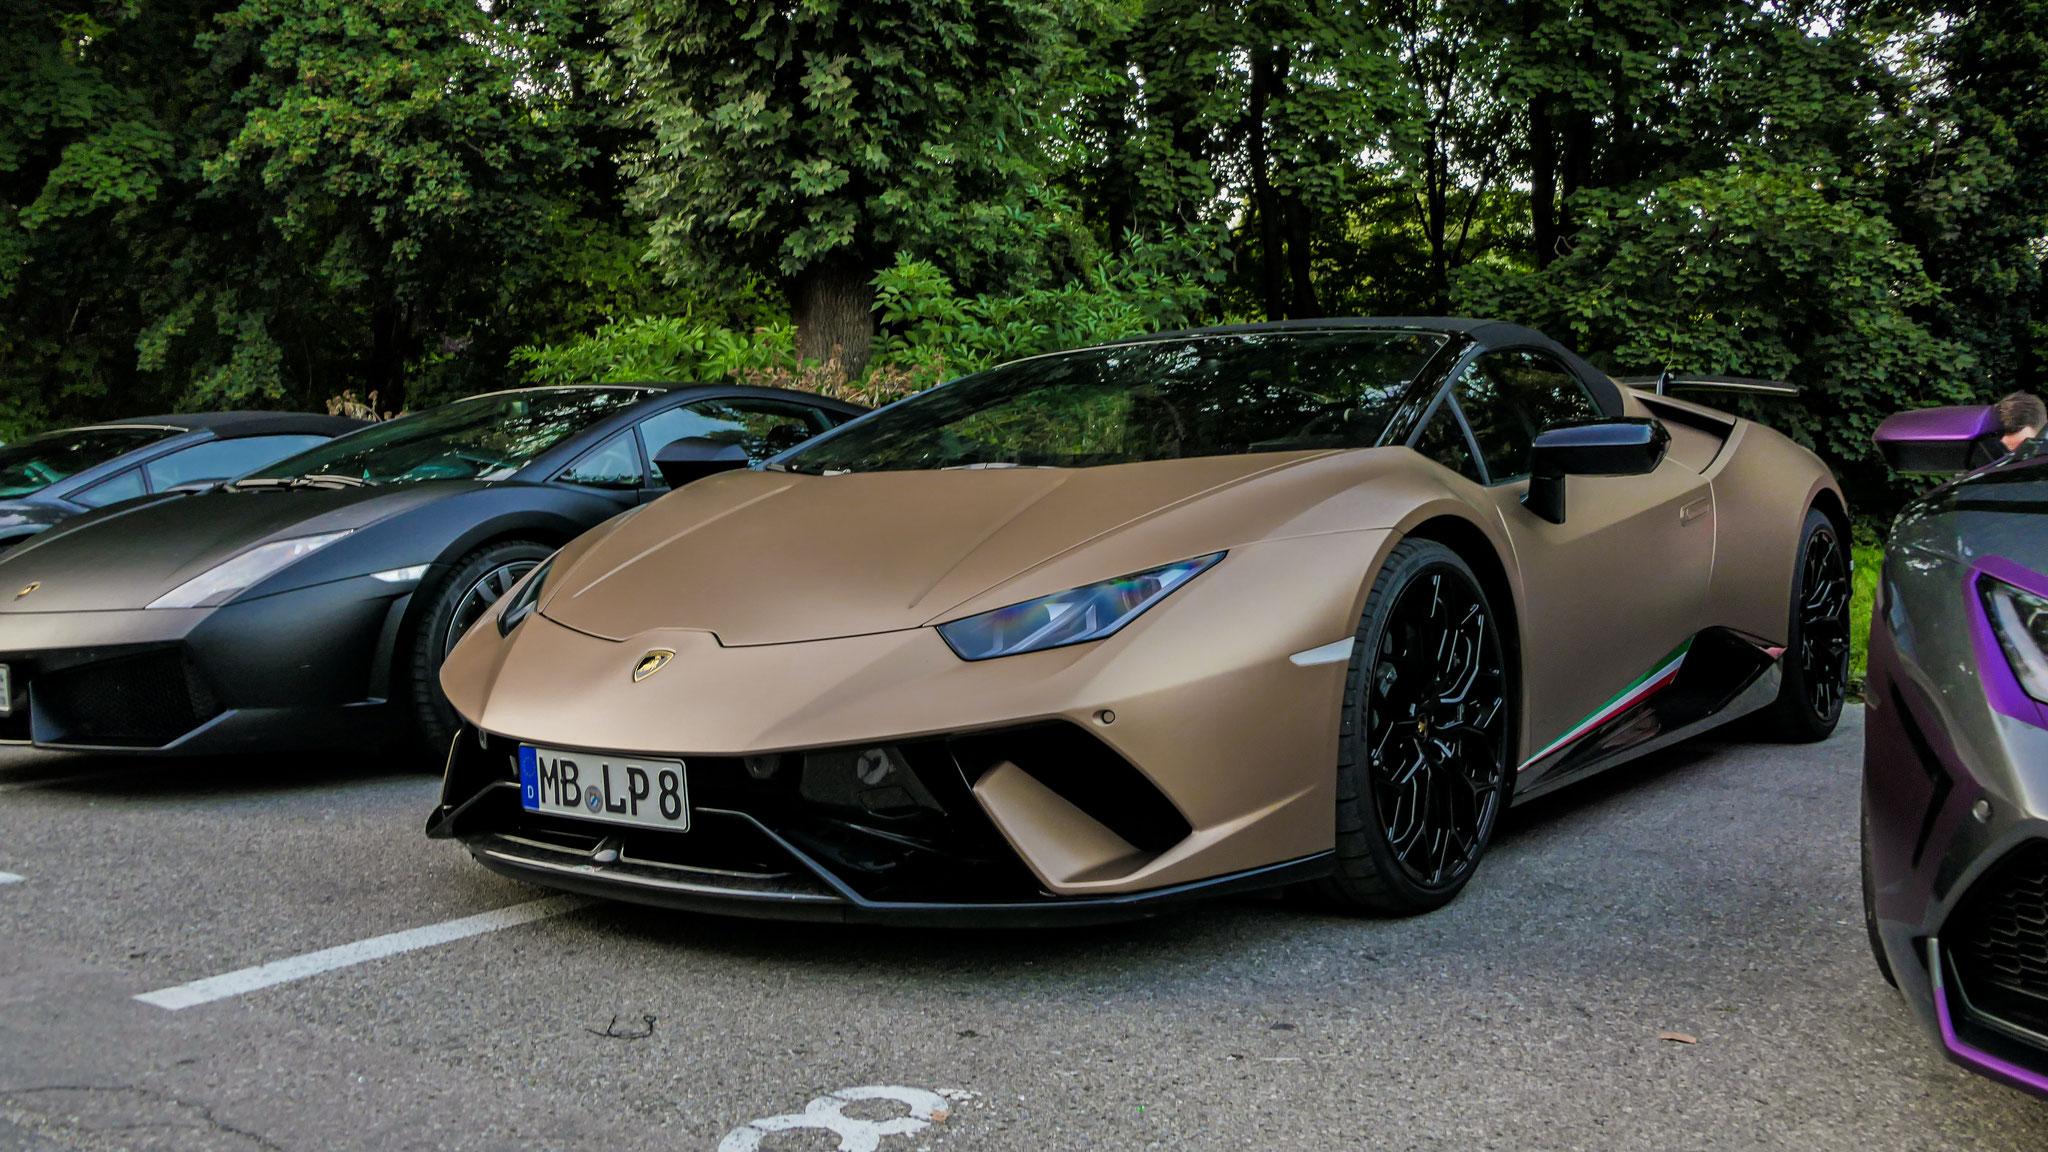 Lamborghini Huracan Performante Spyder - MB-LP-8